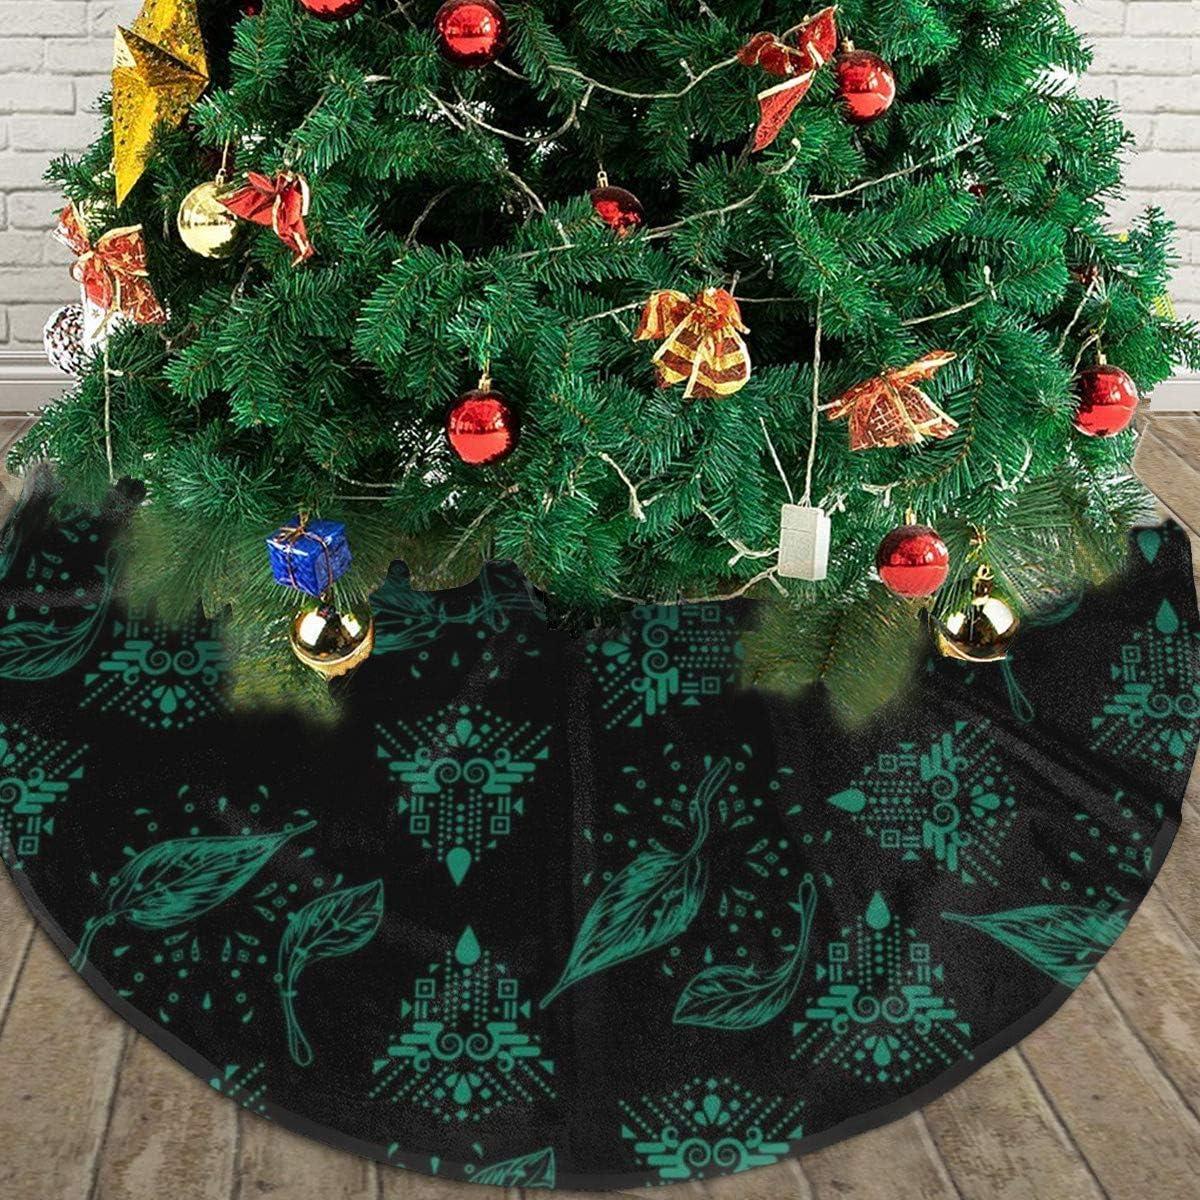 Green Christmas Tree Ideas 2020 Amazon.com: Christmas Tree Skirt, Dark Green Rustic Or Stylish